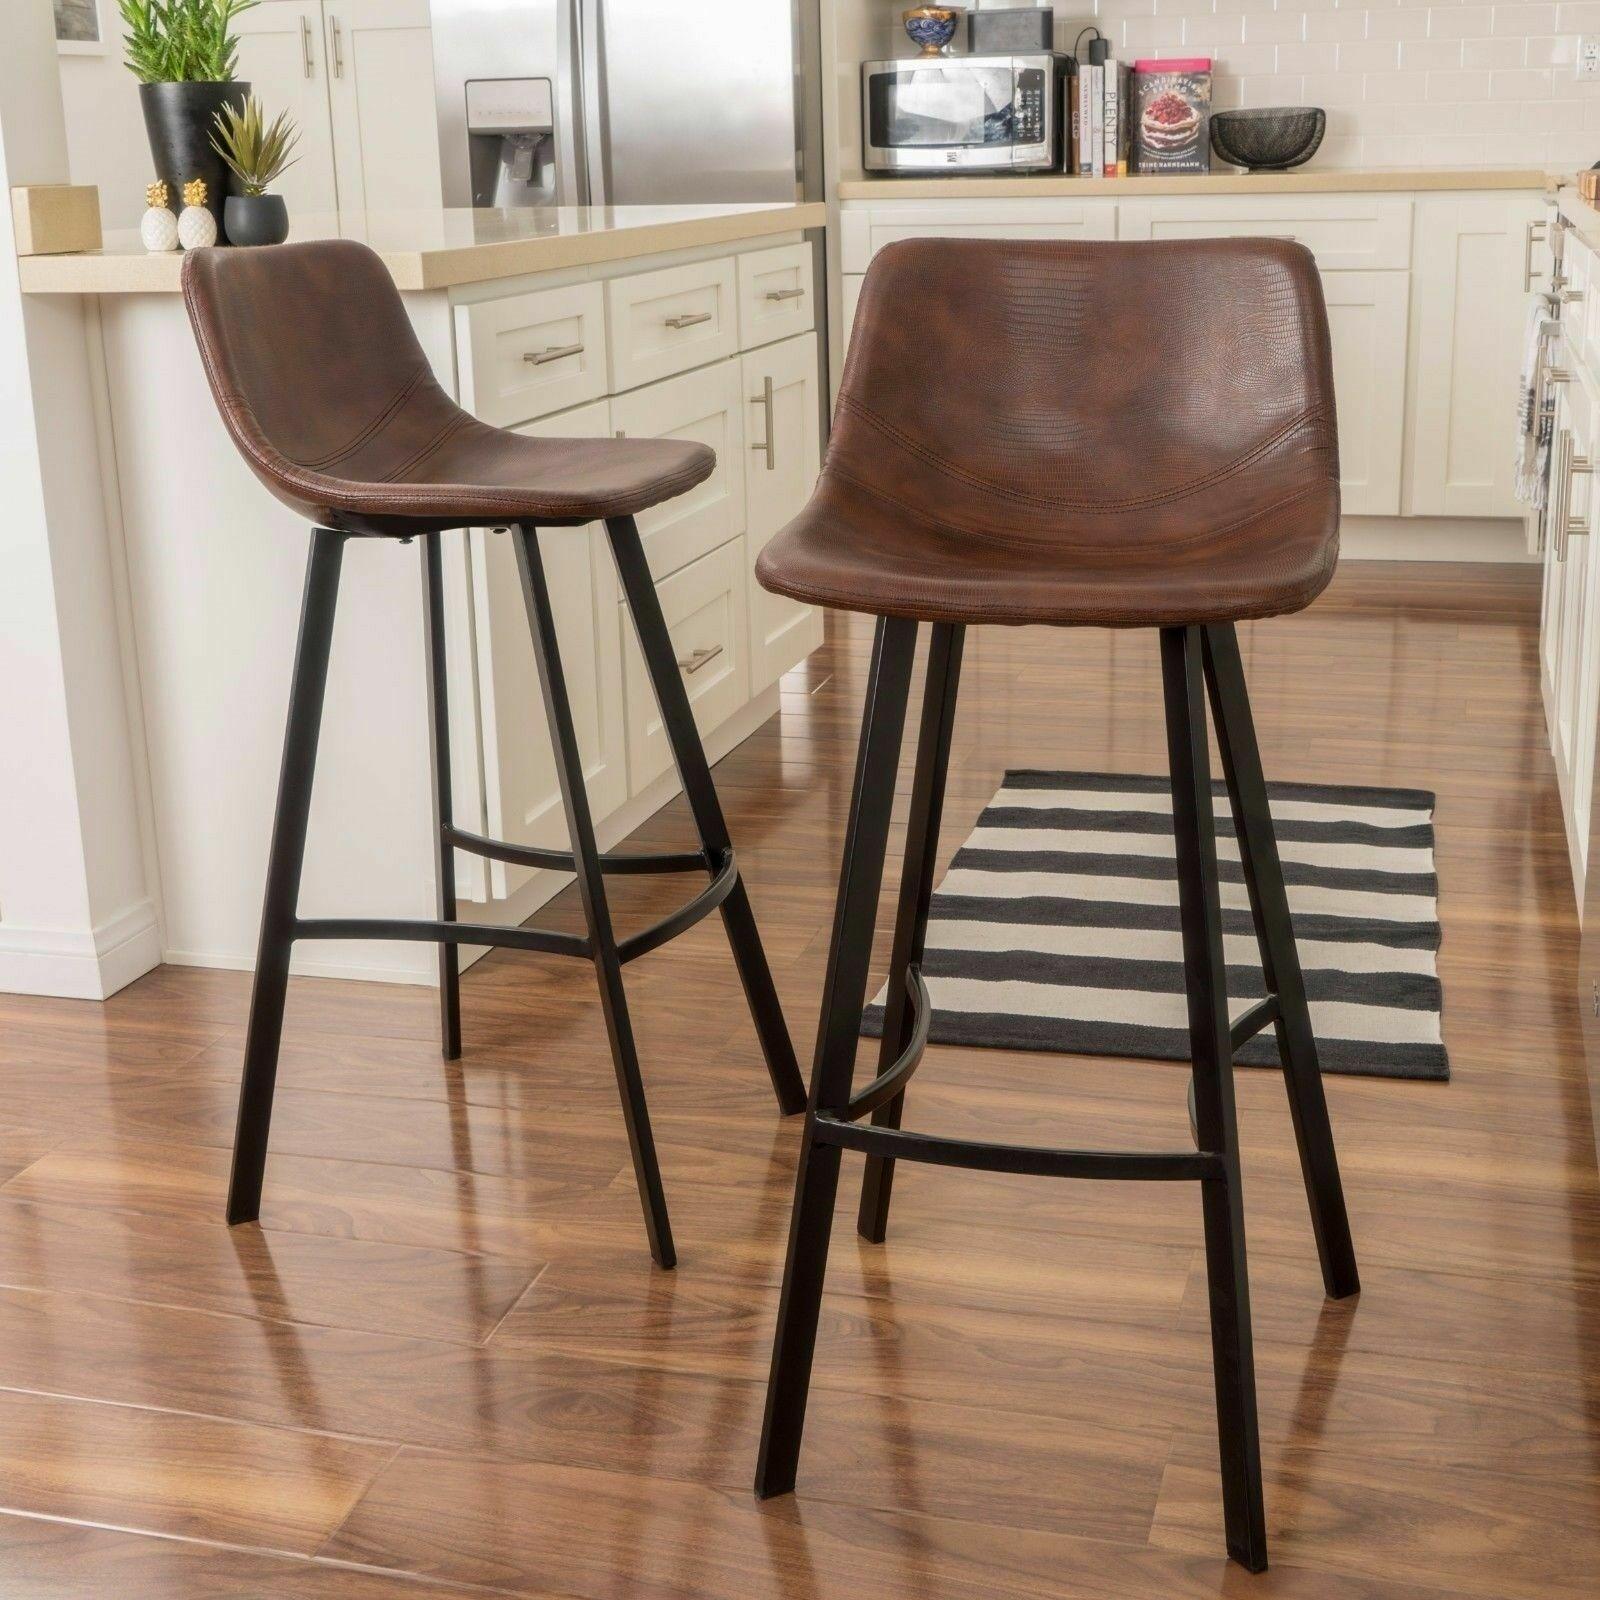 Rex Modern Upholstered Bar Stool (Set of 2) Benches, Stools & Bar Stools